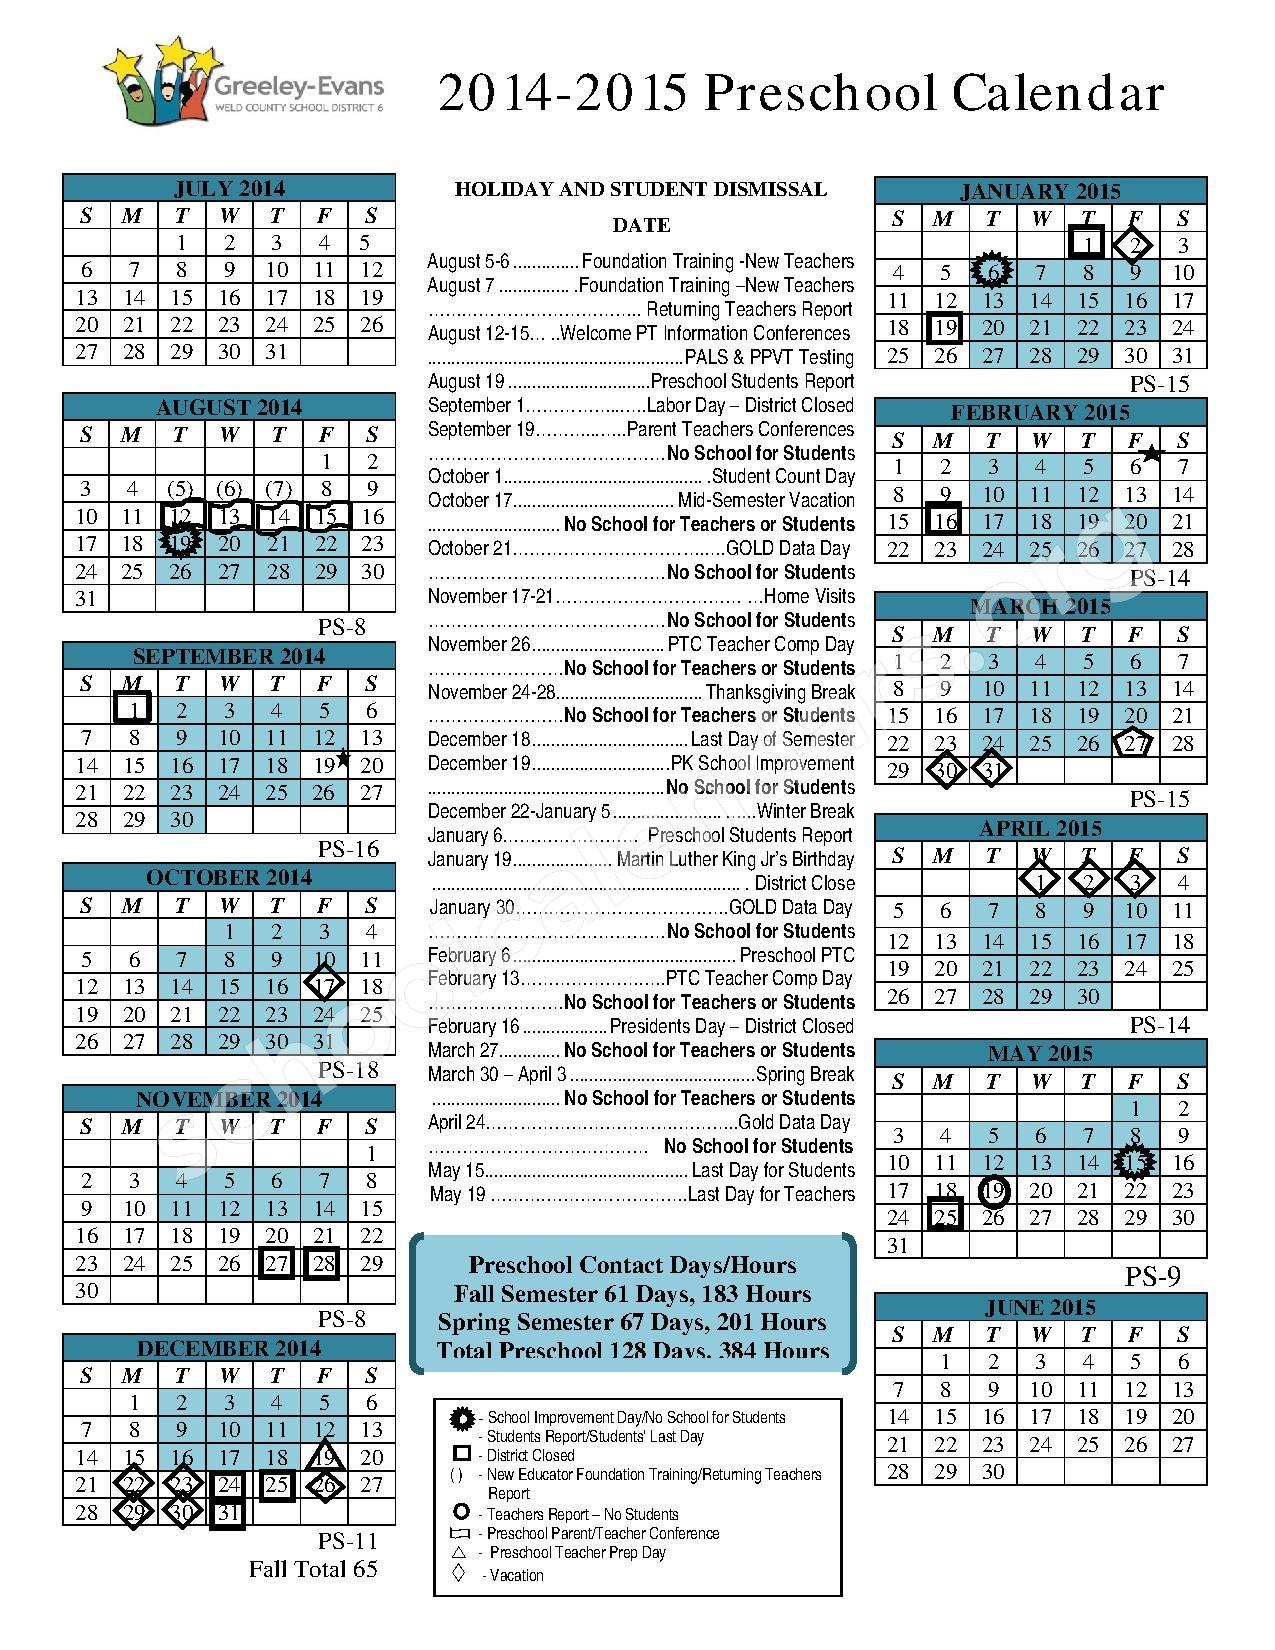 Spartanburg District 6 Calendar | Calendar Image Base